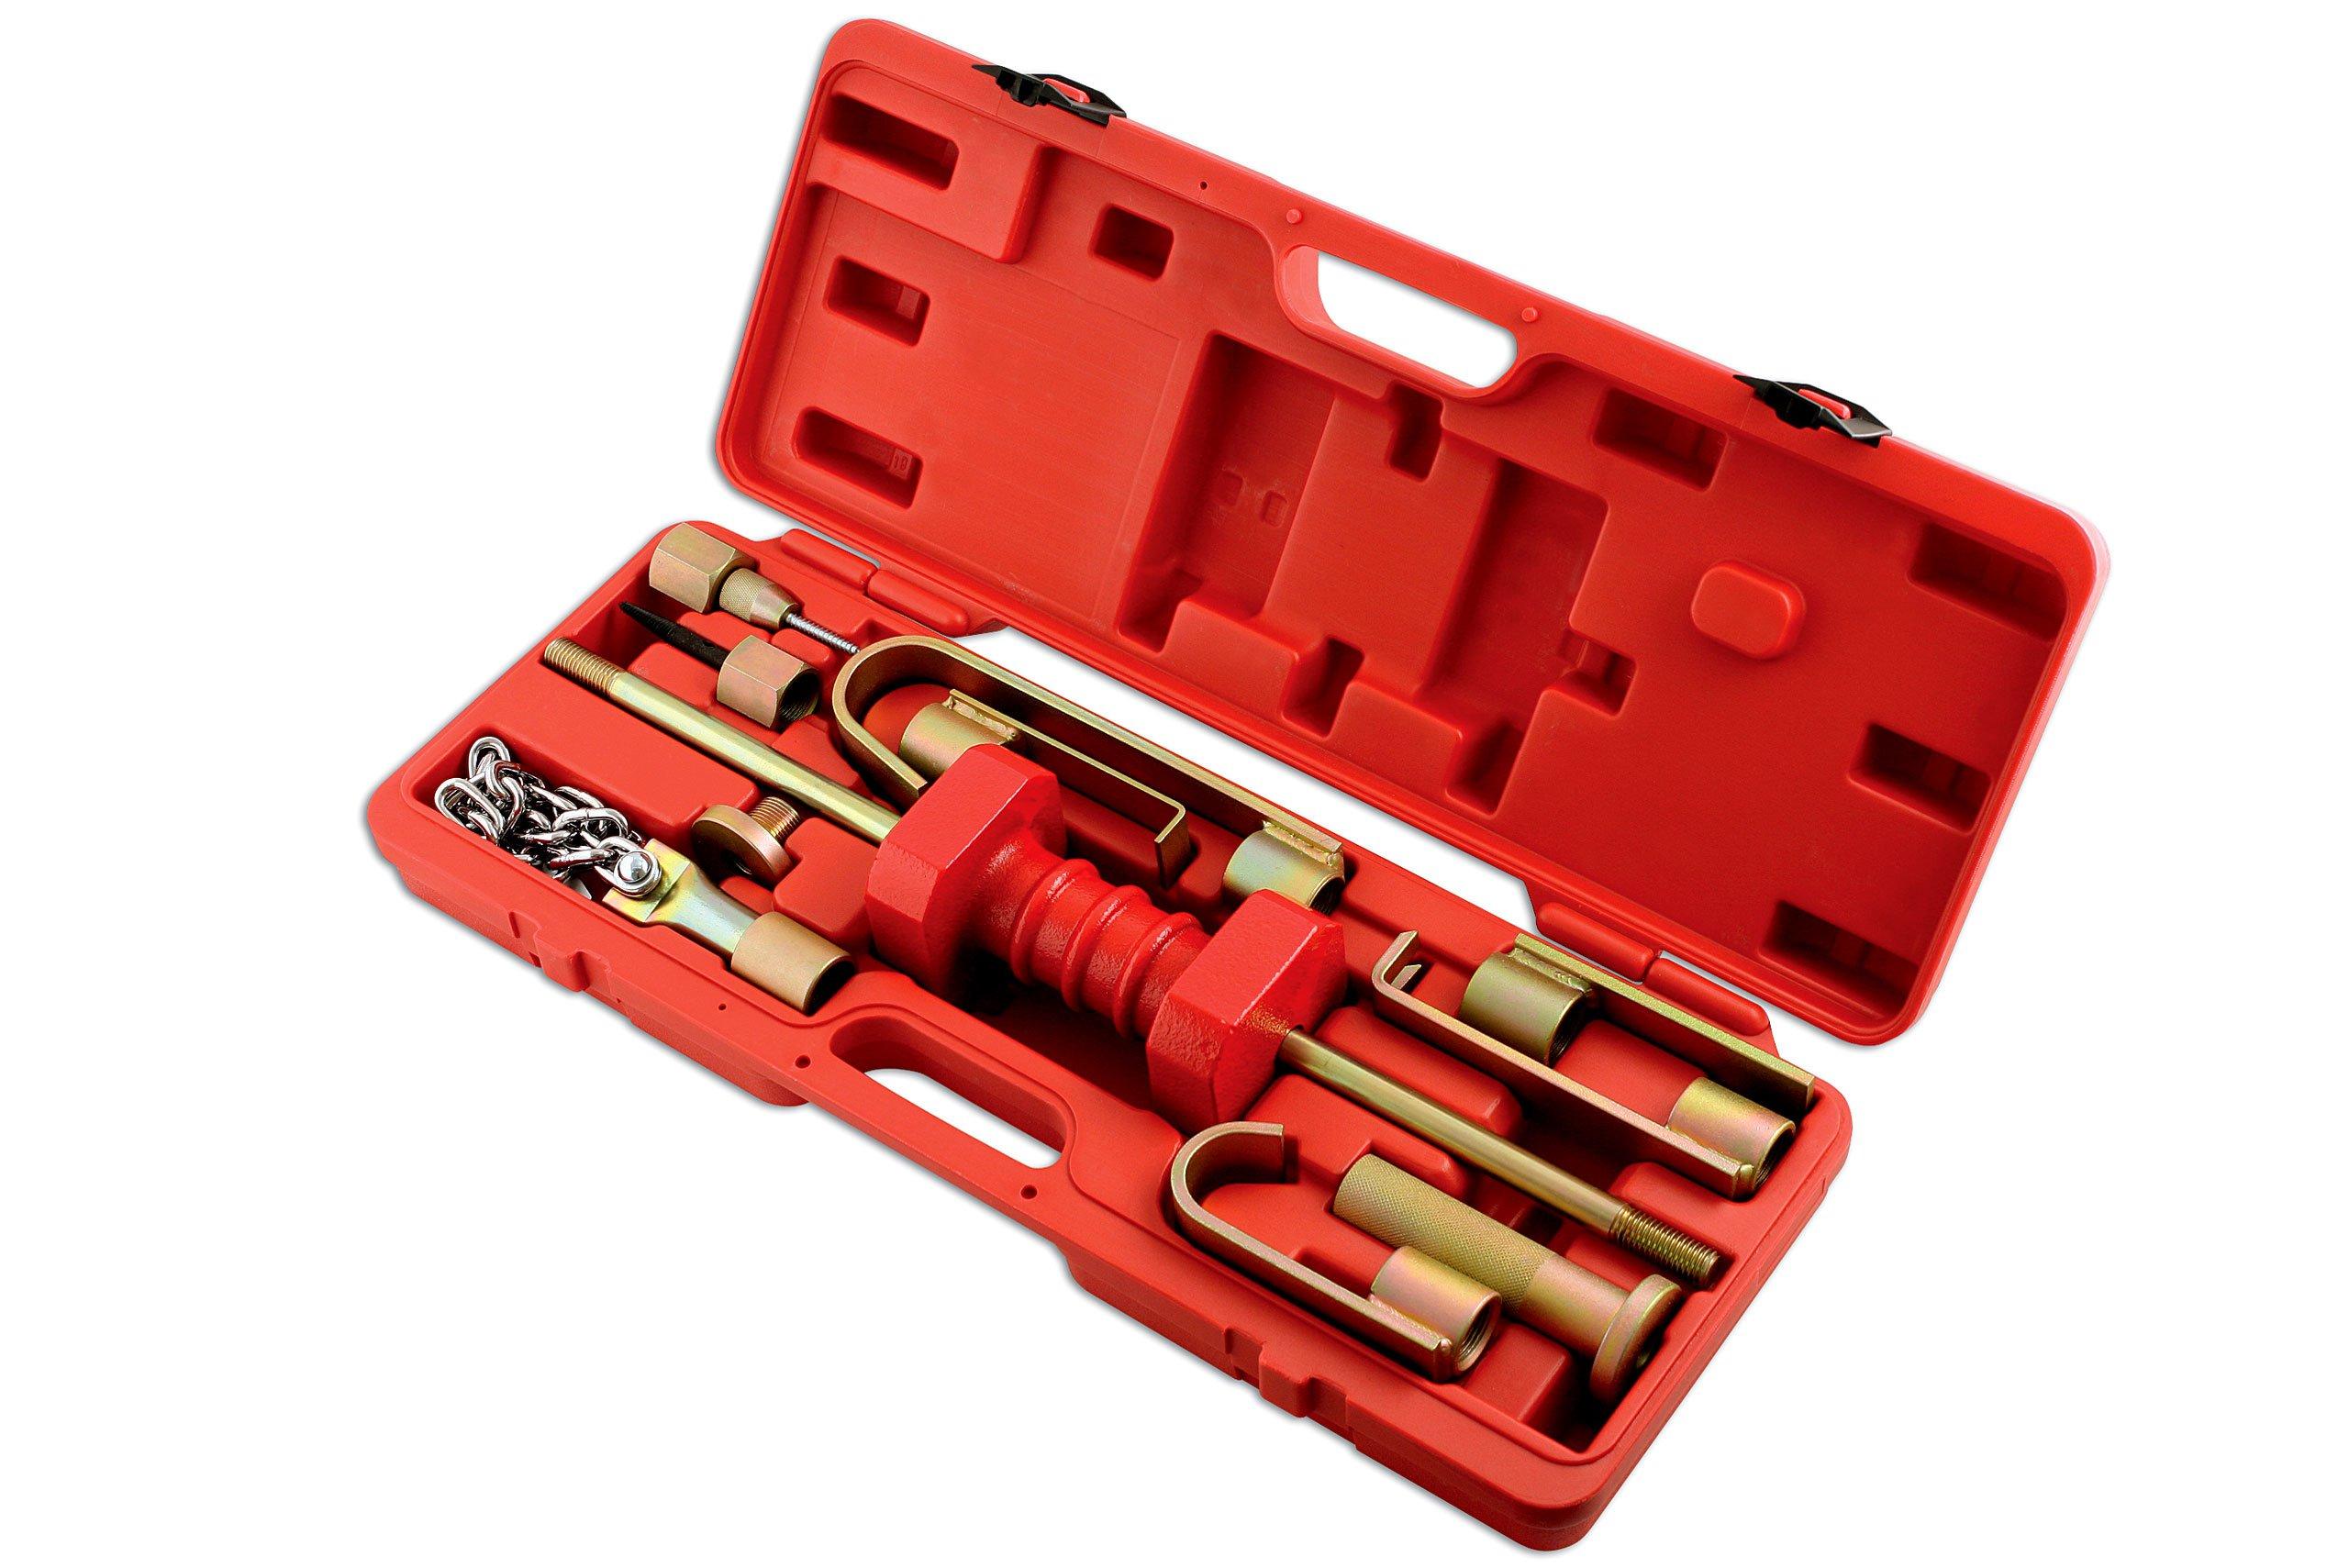 Power-Tec - 92297 Bodywork Slide Hammer Set 5.4kgs by POWERTEC (Image #3)